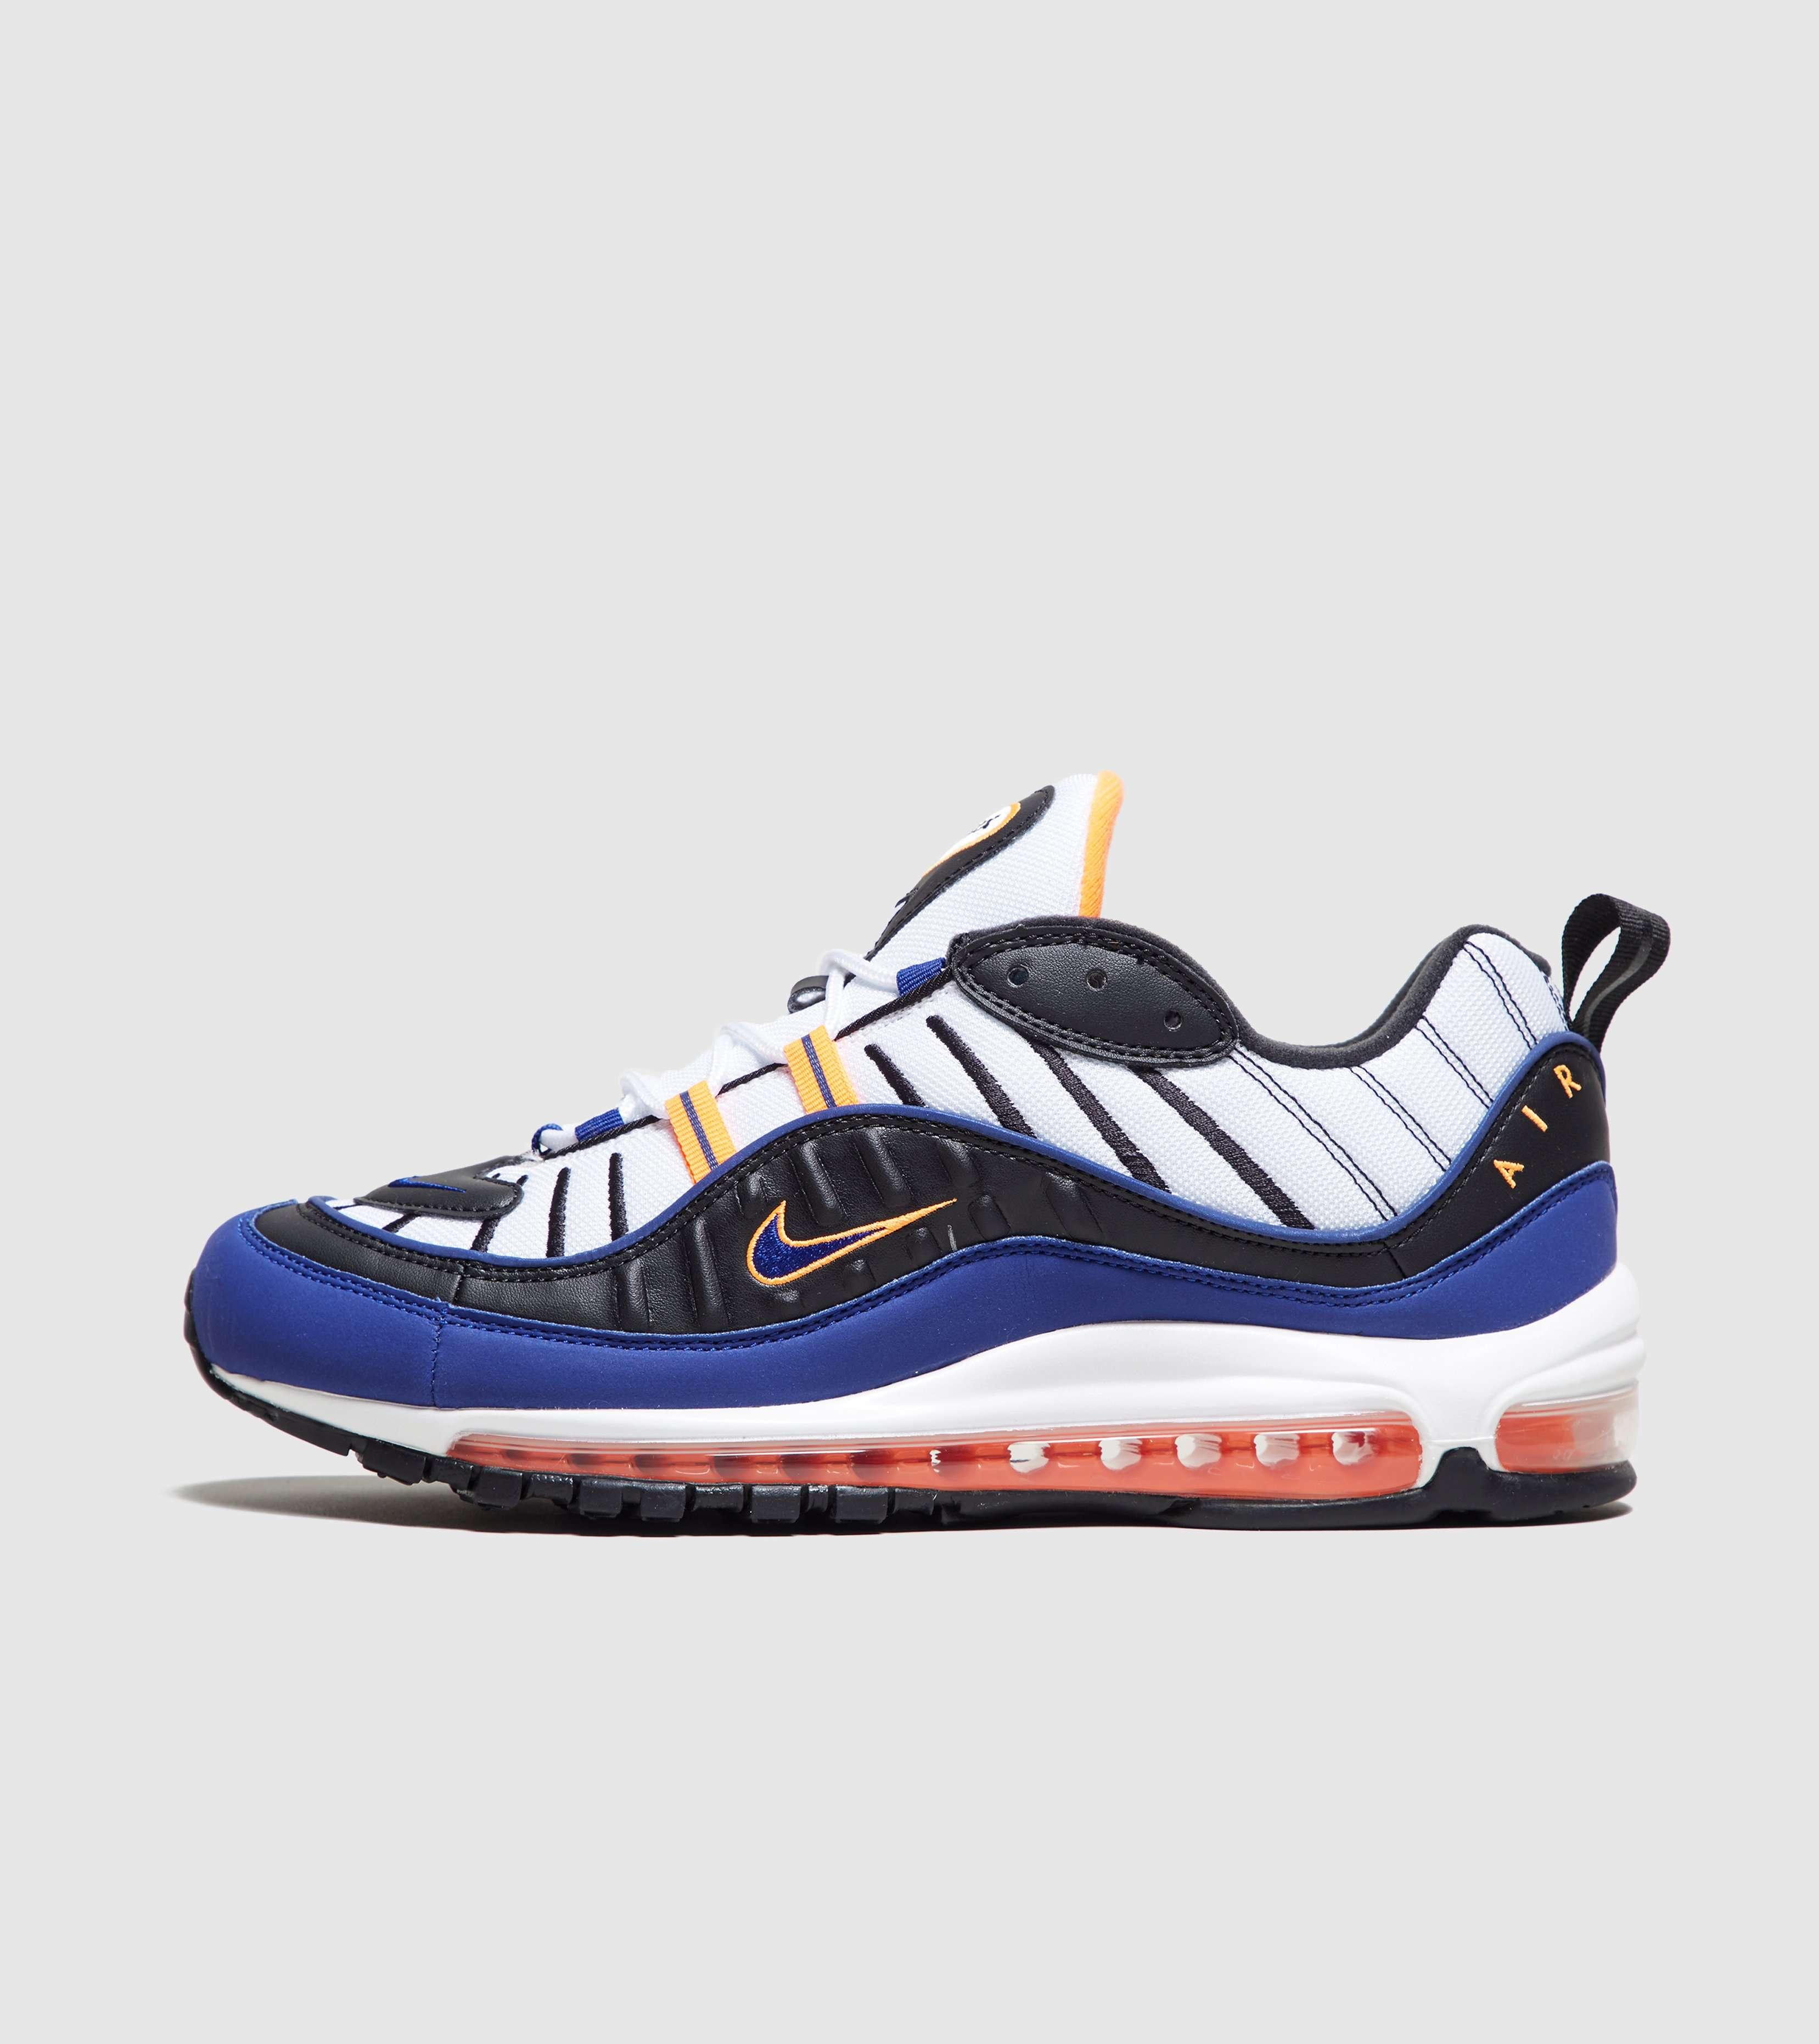 best website 4bef1 e68a1 Nike Air Max 98 OG | Size?